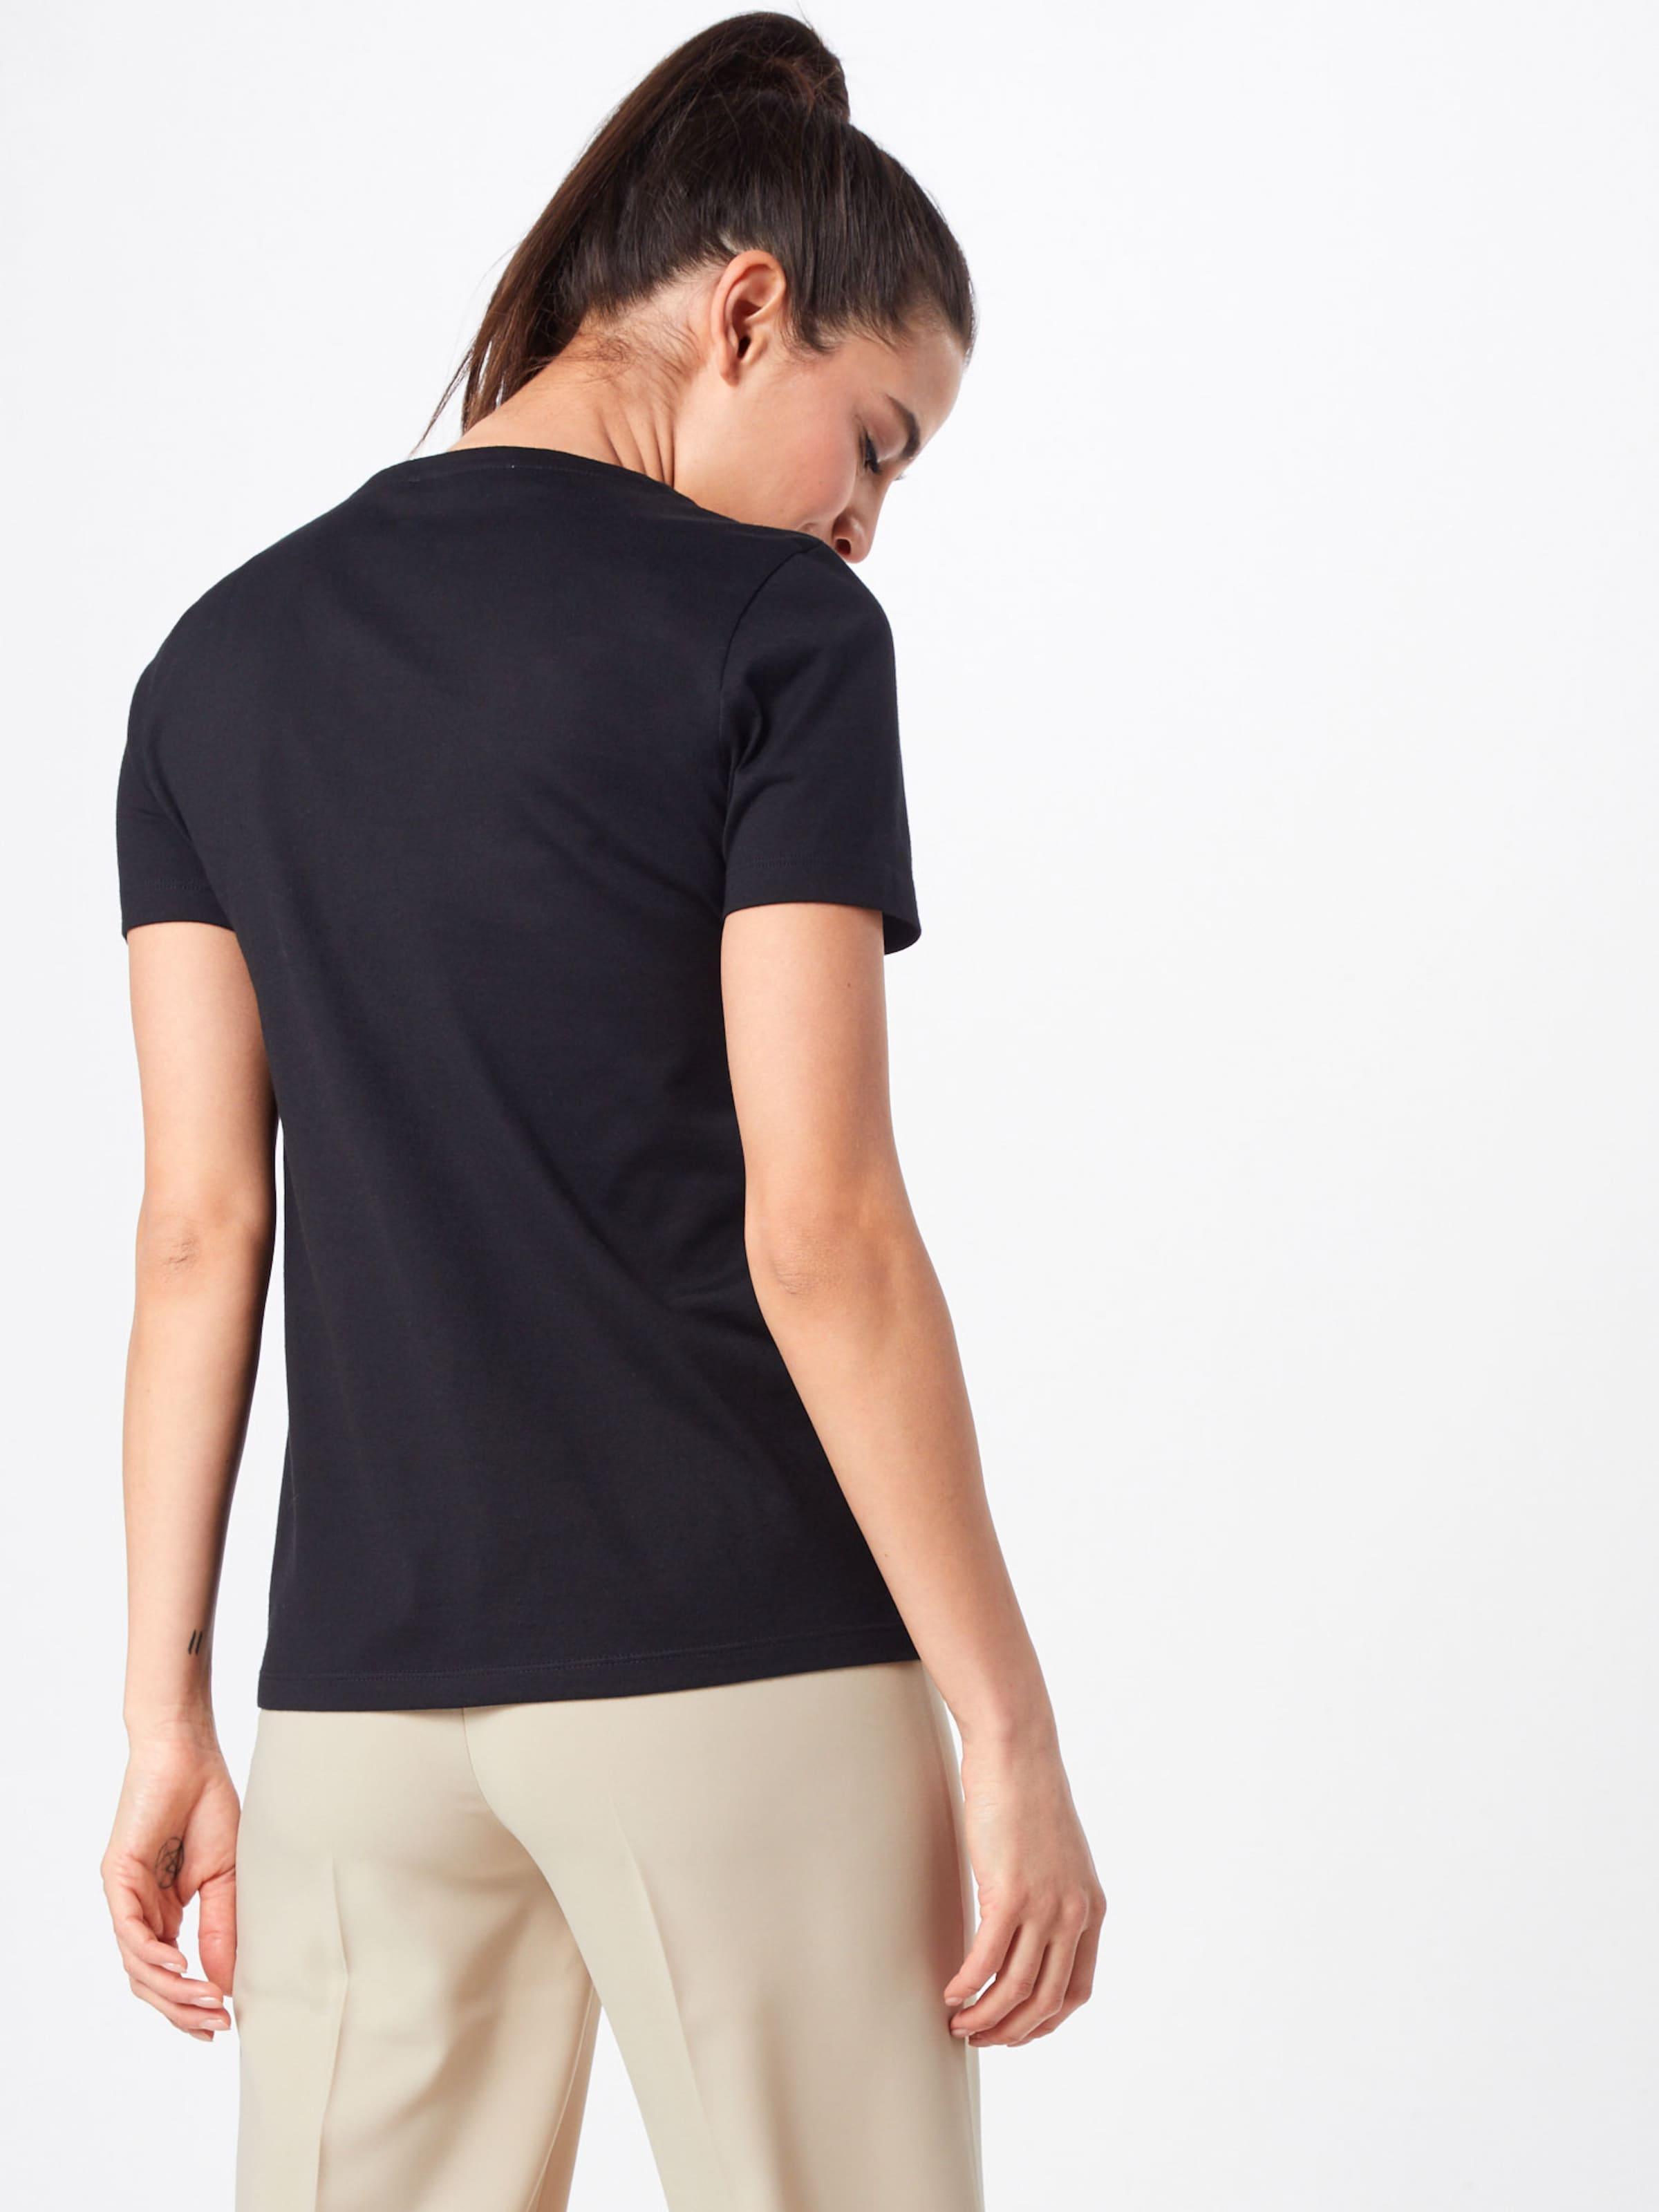 In Lacoste Lacoste In In Schwarz Schwarz Lacoste Shirt Schwarz Shirt Shirt OX8Pk0wn